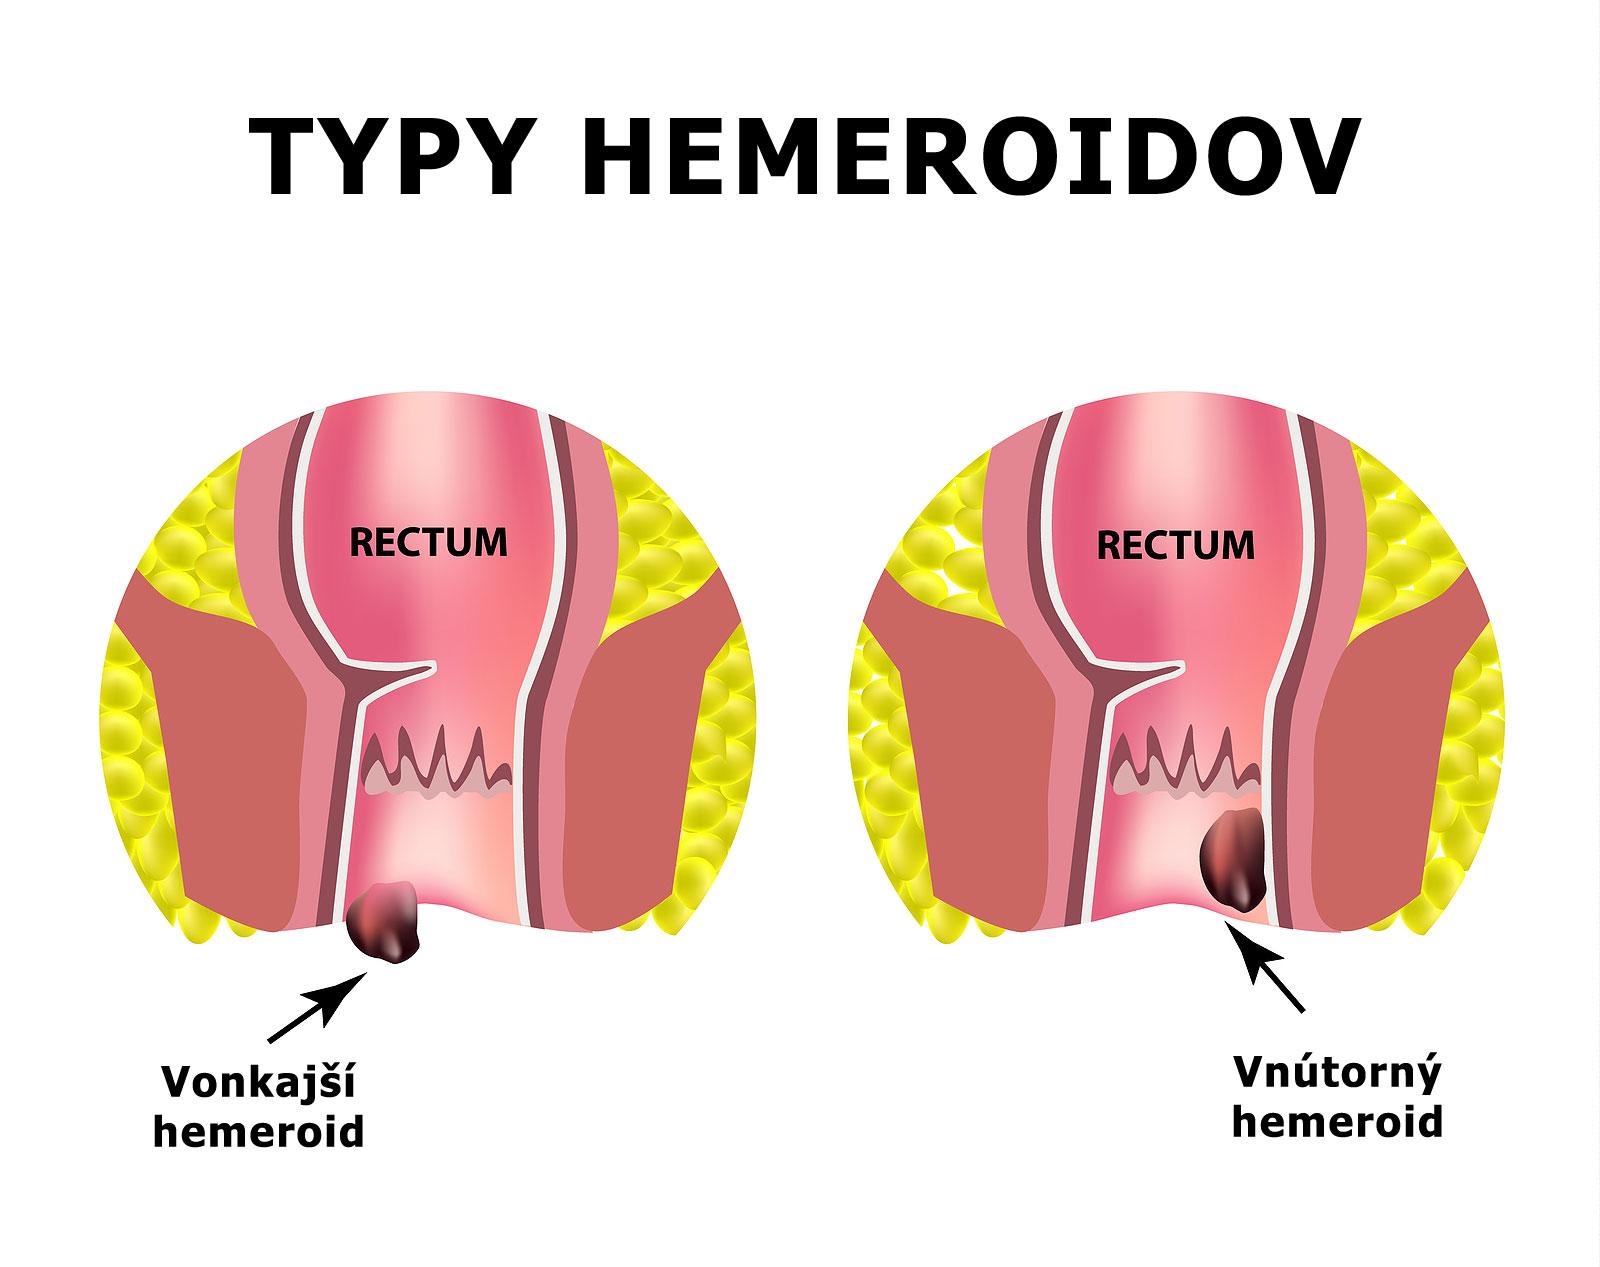 hemeroidy rozdelenie